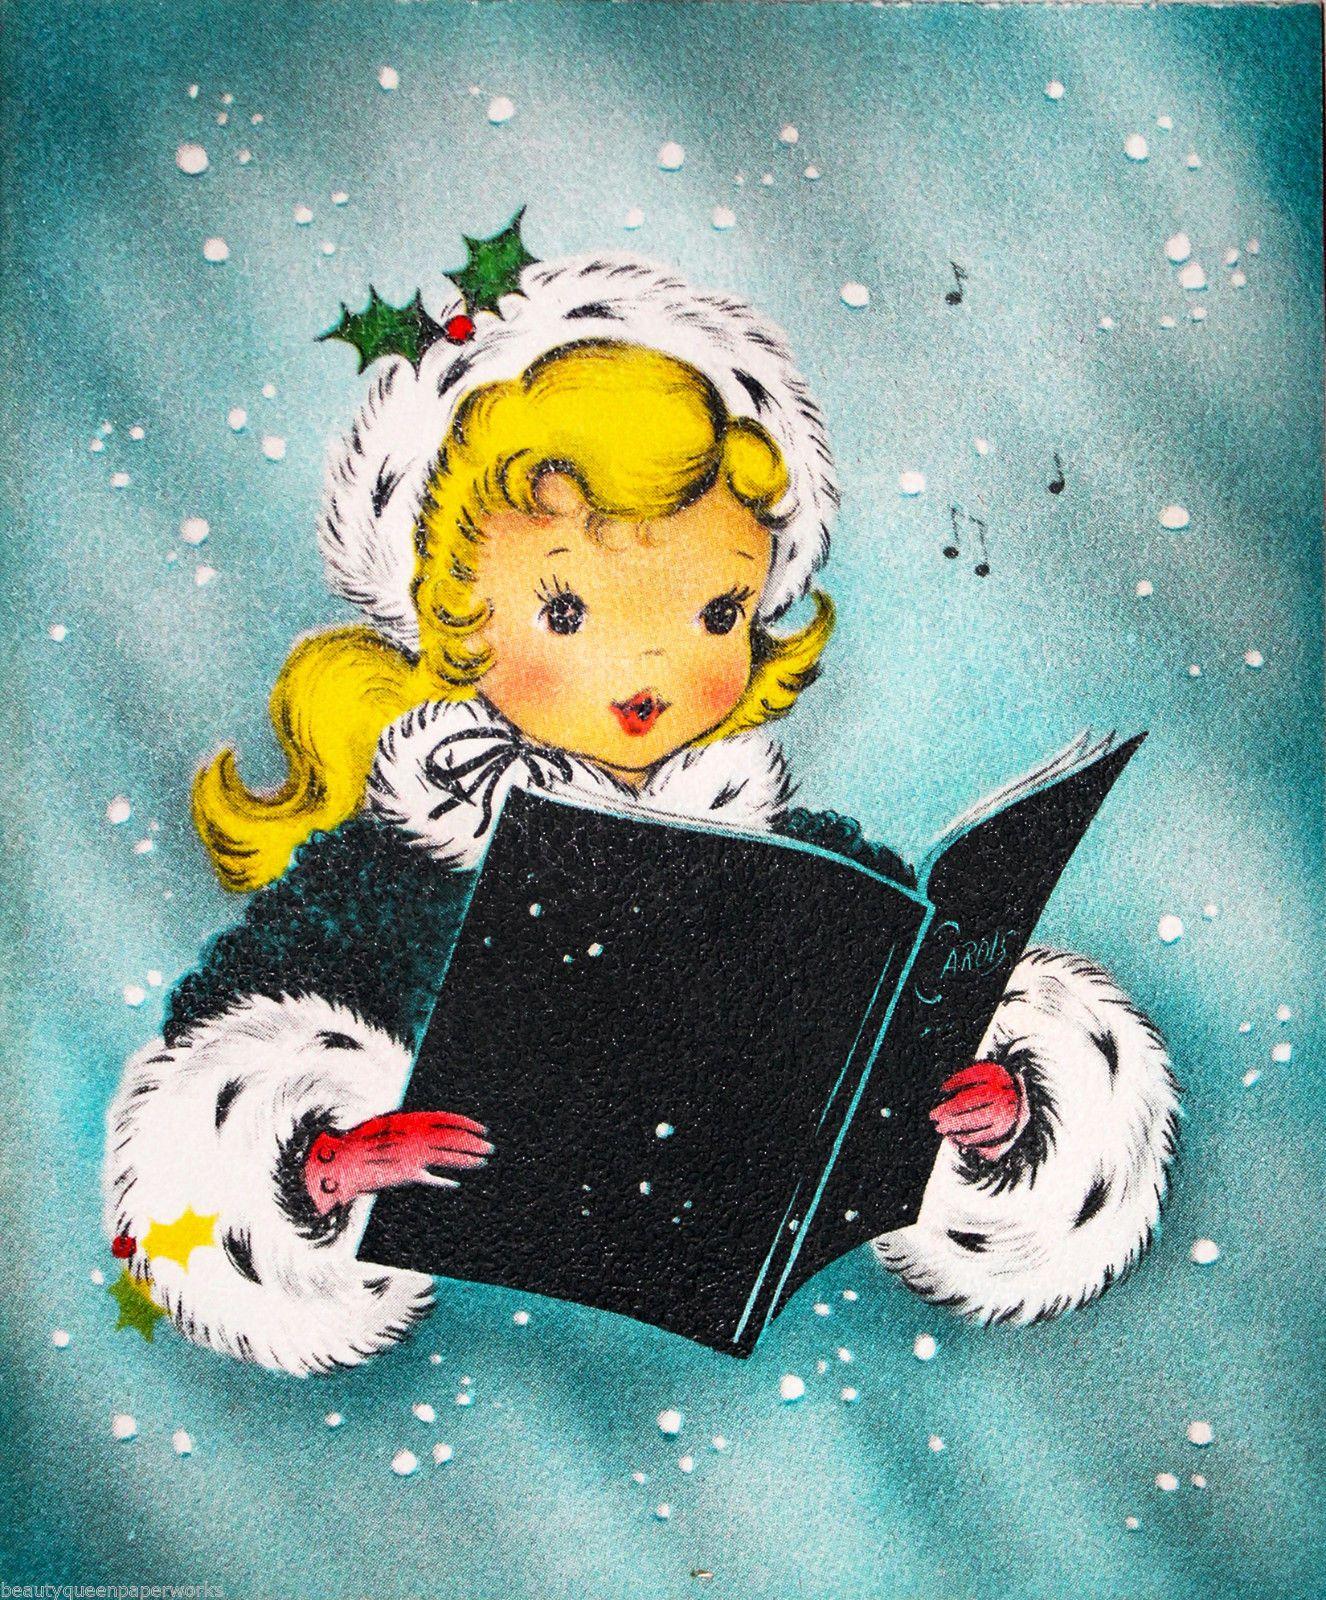 Weihnachtsbilder Pinterest.Sweet Blonde Girl Singing Christmas Carol Song Book 40 S Vintage